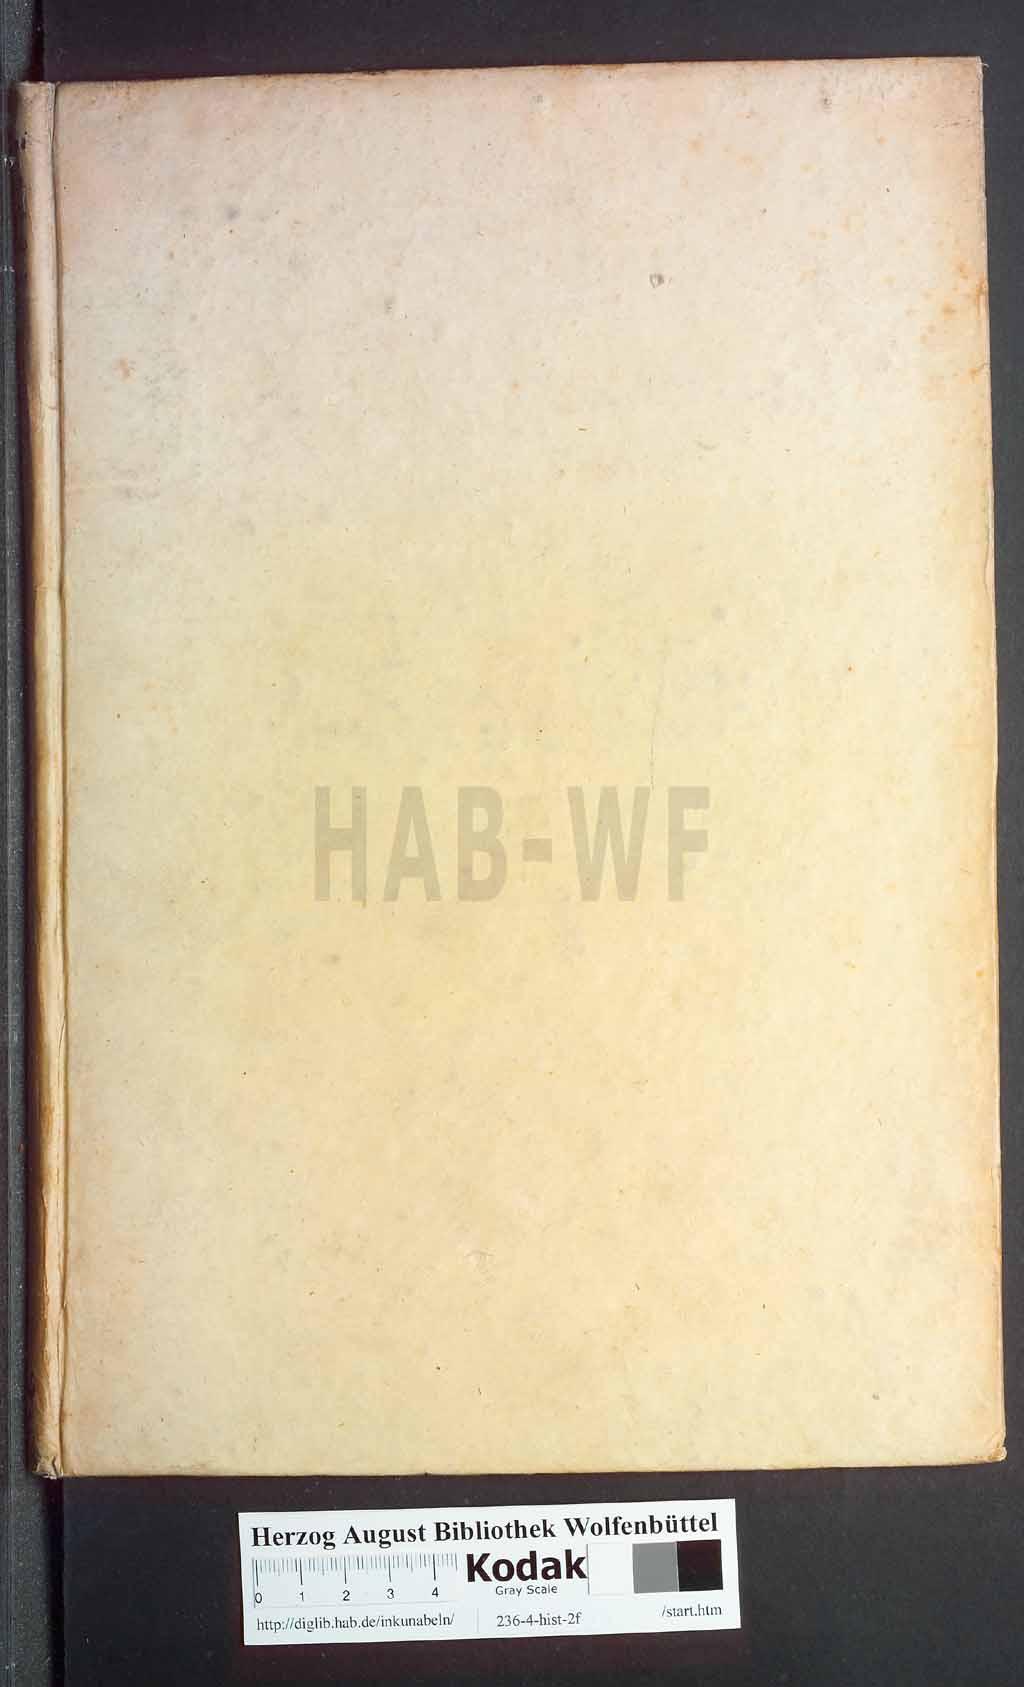 http://diglib.hab.de/inkunabeln/236-4-hist-2f/00001.jpg